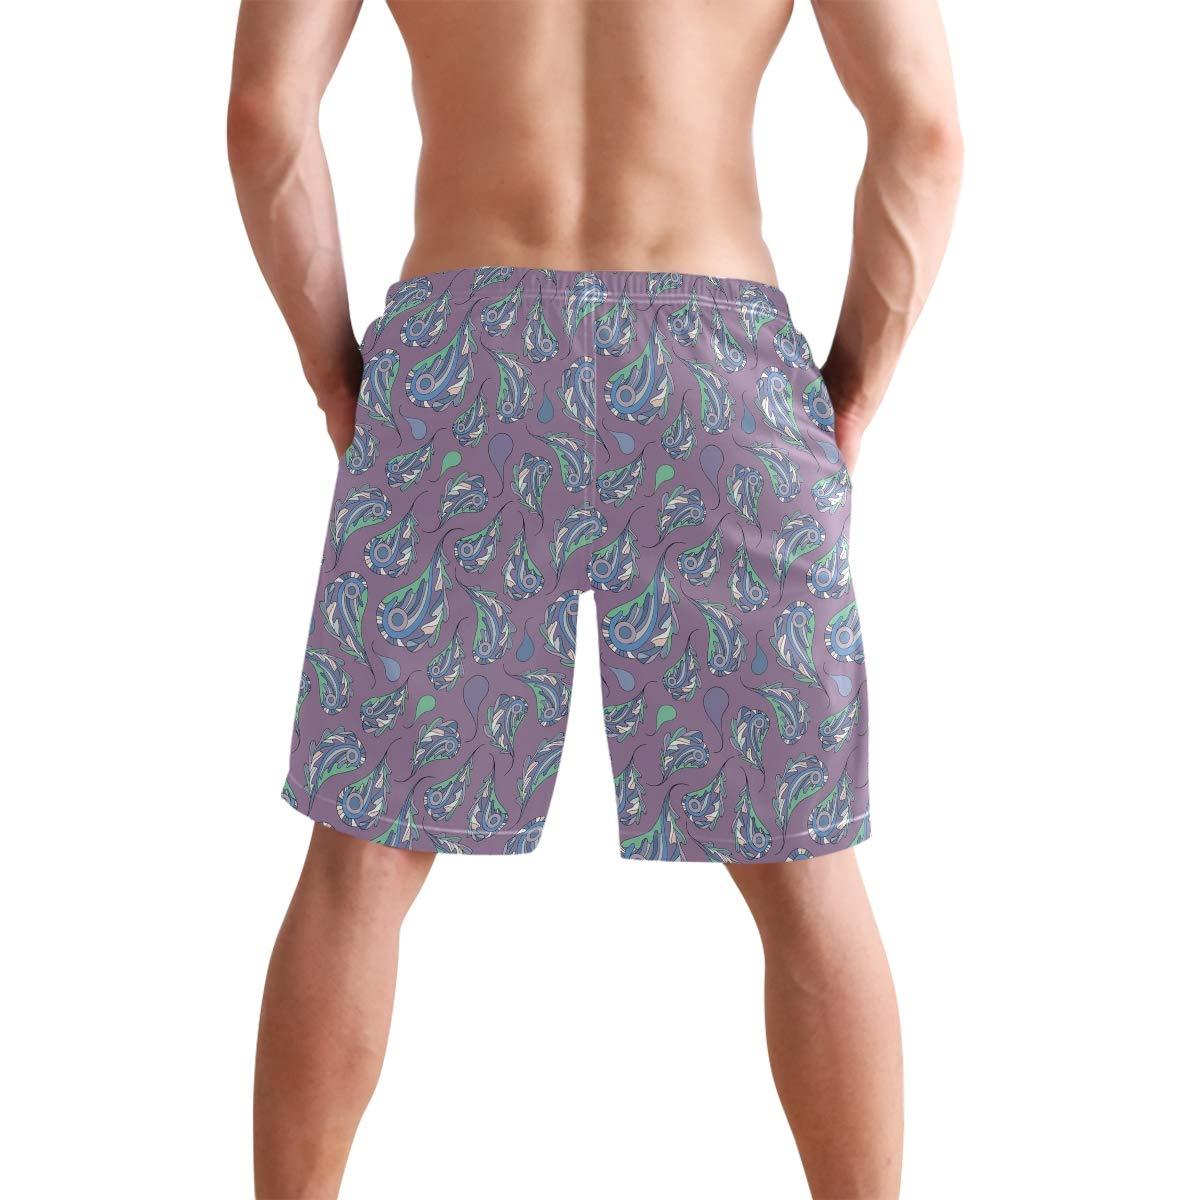 Zoe Dull Mens Medium Length Paisley and Oak Leaves Beach Shorts Casual Athletic Swimming Pants